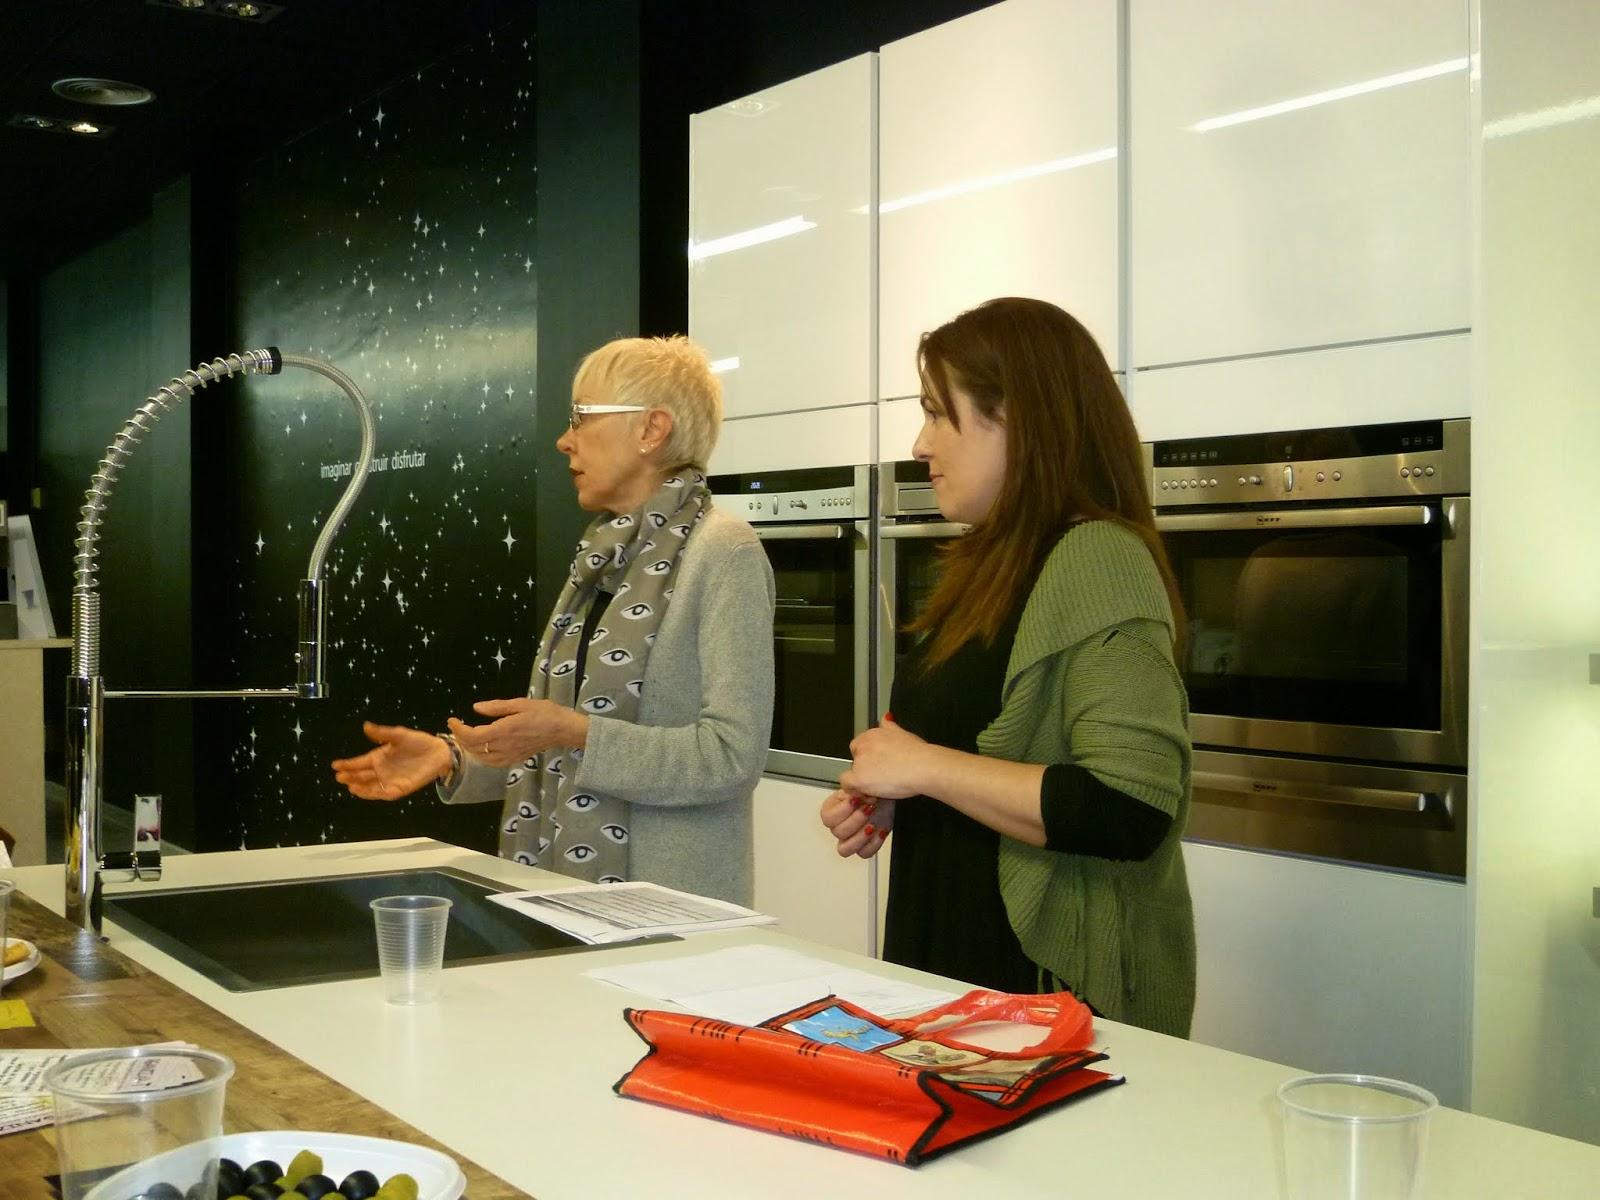 Organizar t charla en the singular kitchen - Singular kitchen valencia ...